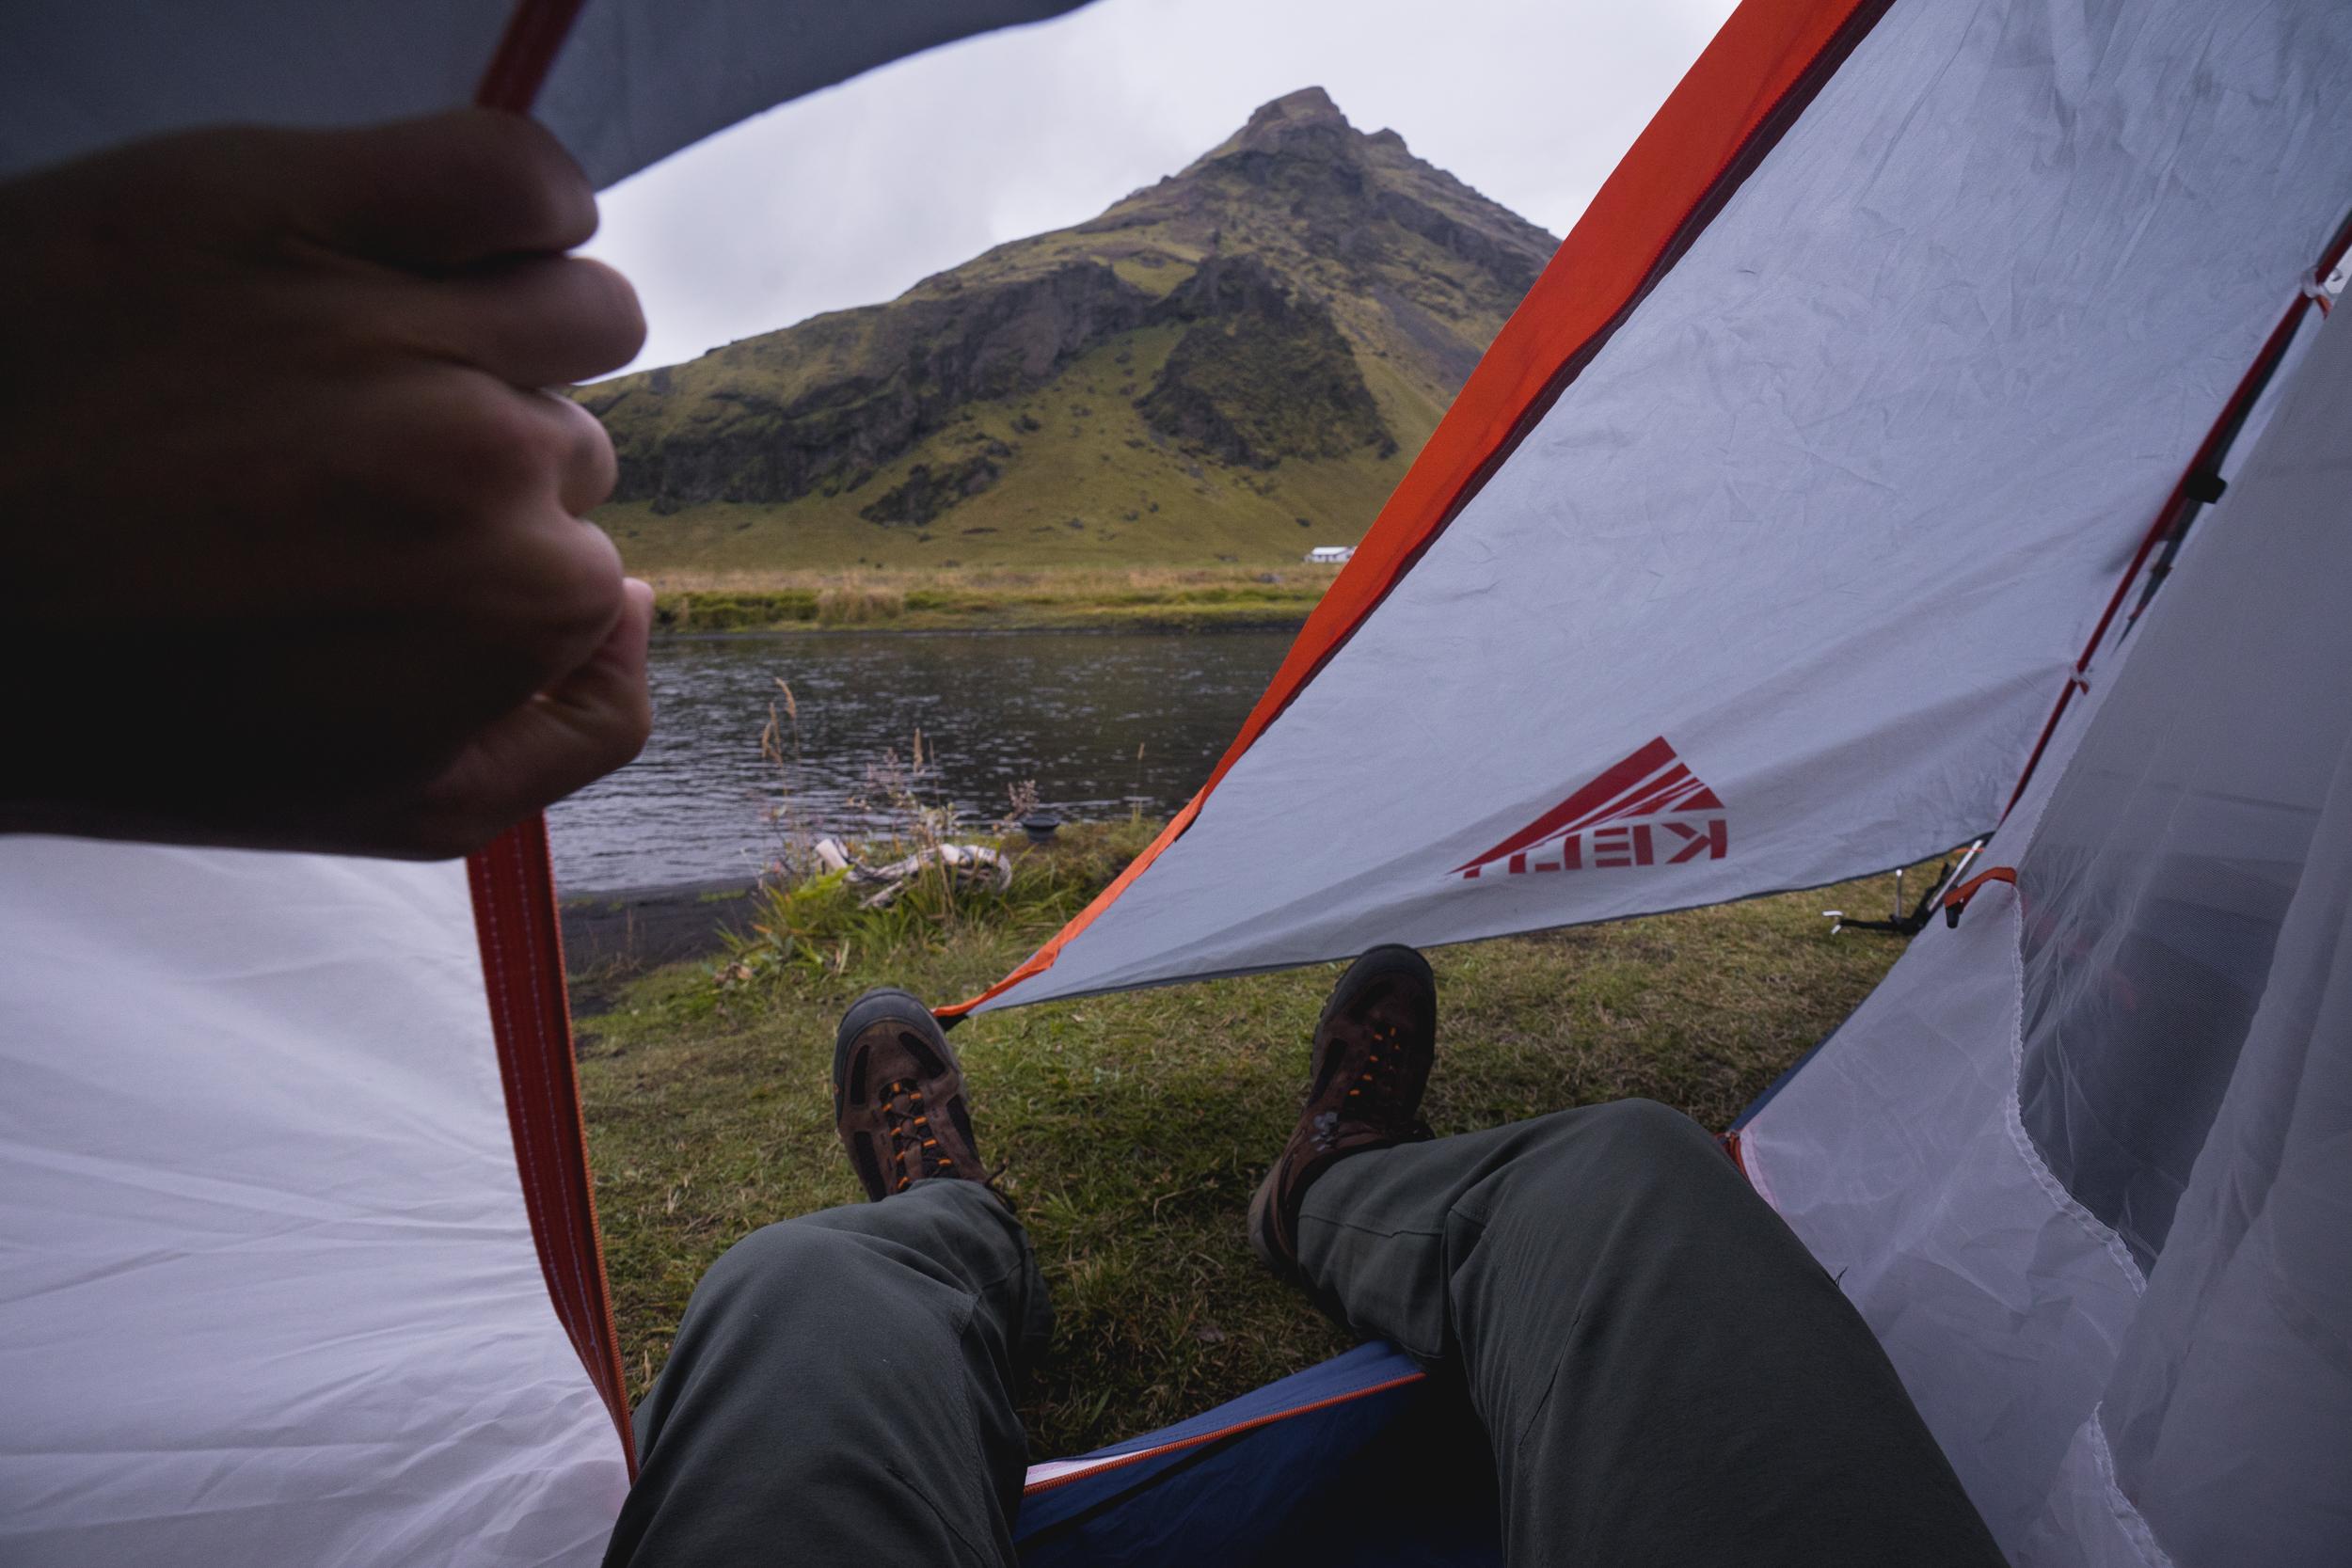 Iceland - 00606 - Chris Goetchius 2017 - WEB UPLOAD ONLY.jpg